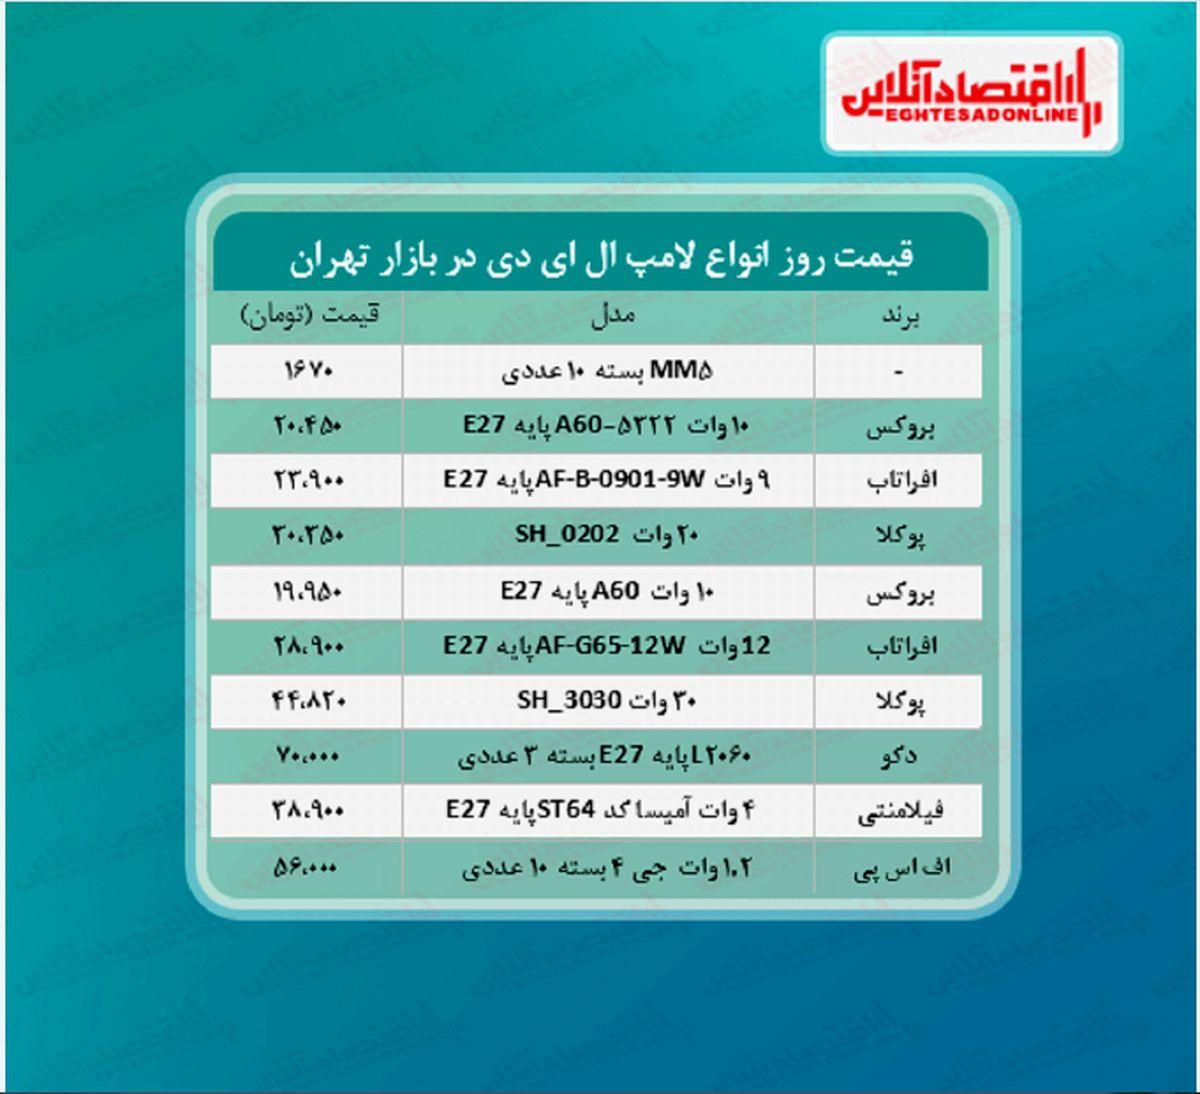 قیمت جدید لامپ ال ای دی (خرداد ۱۴۰۰)